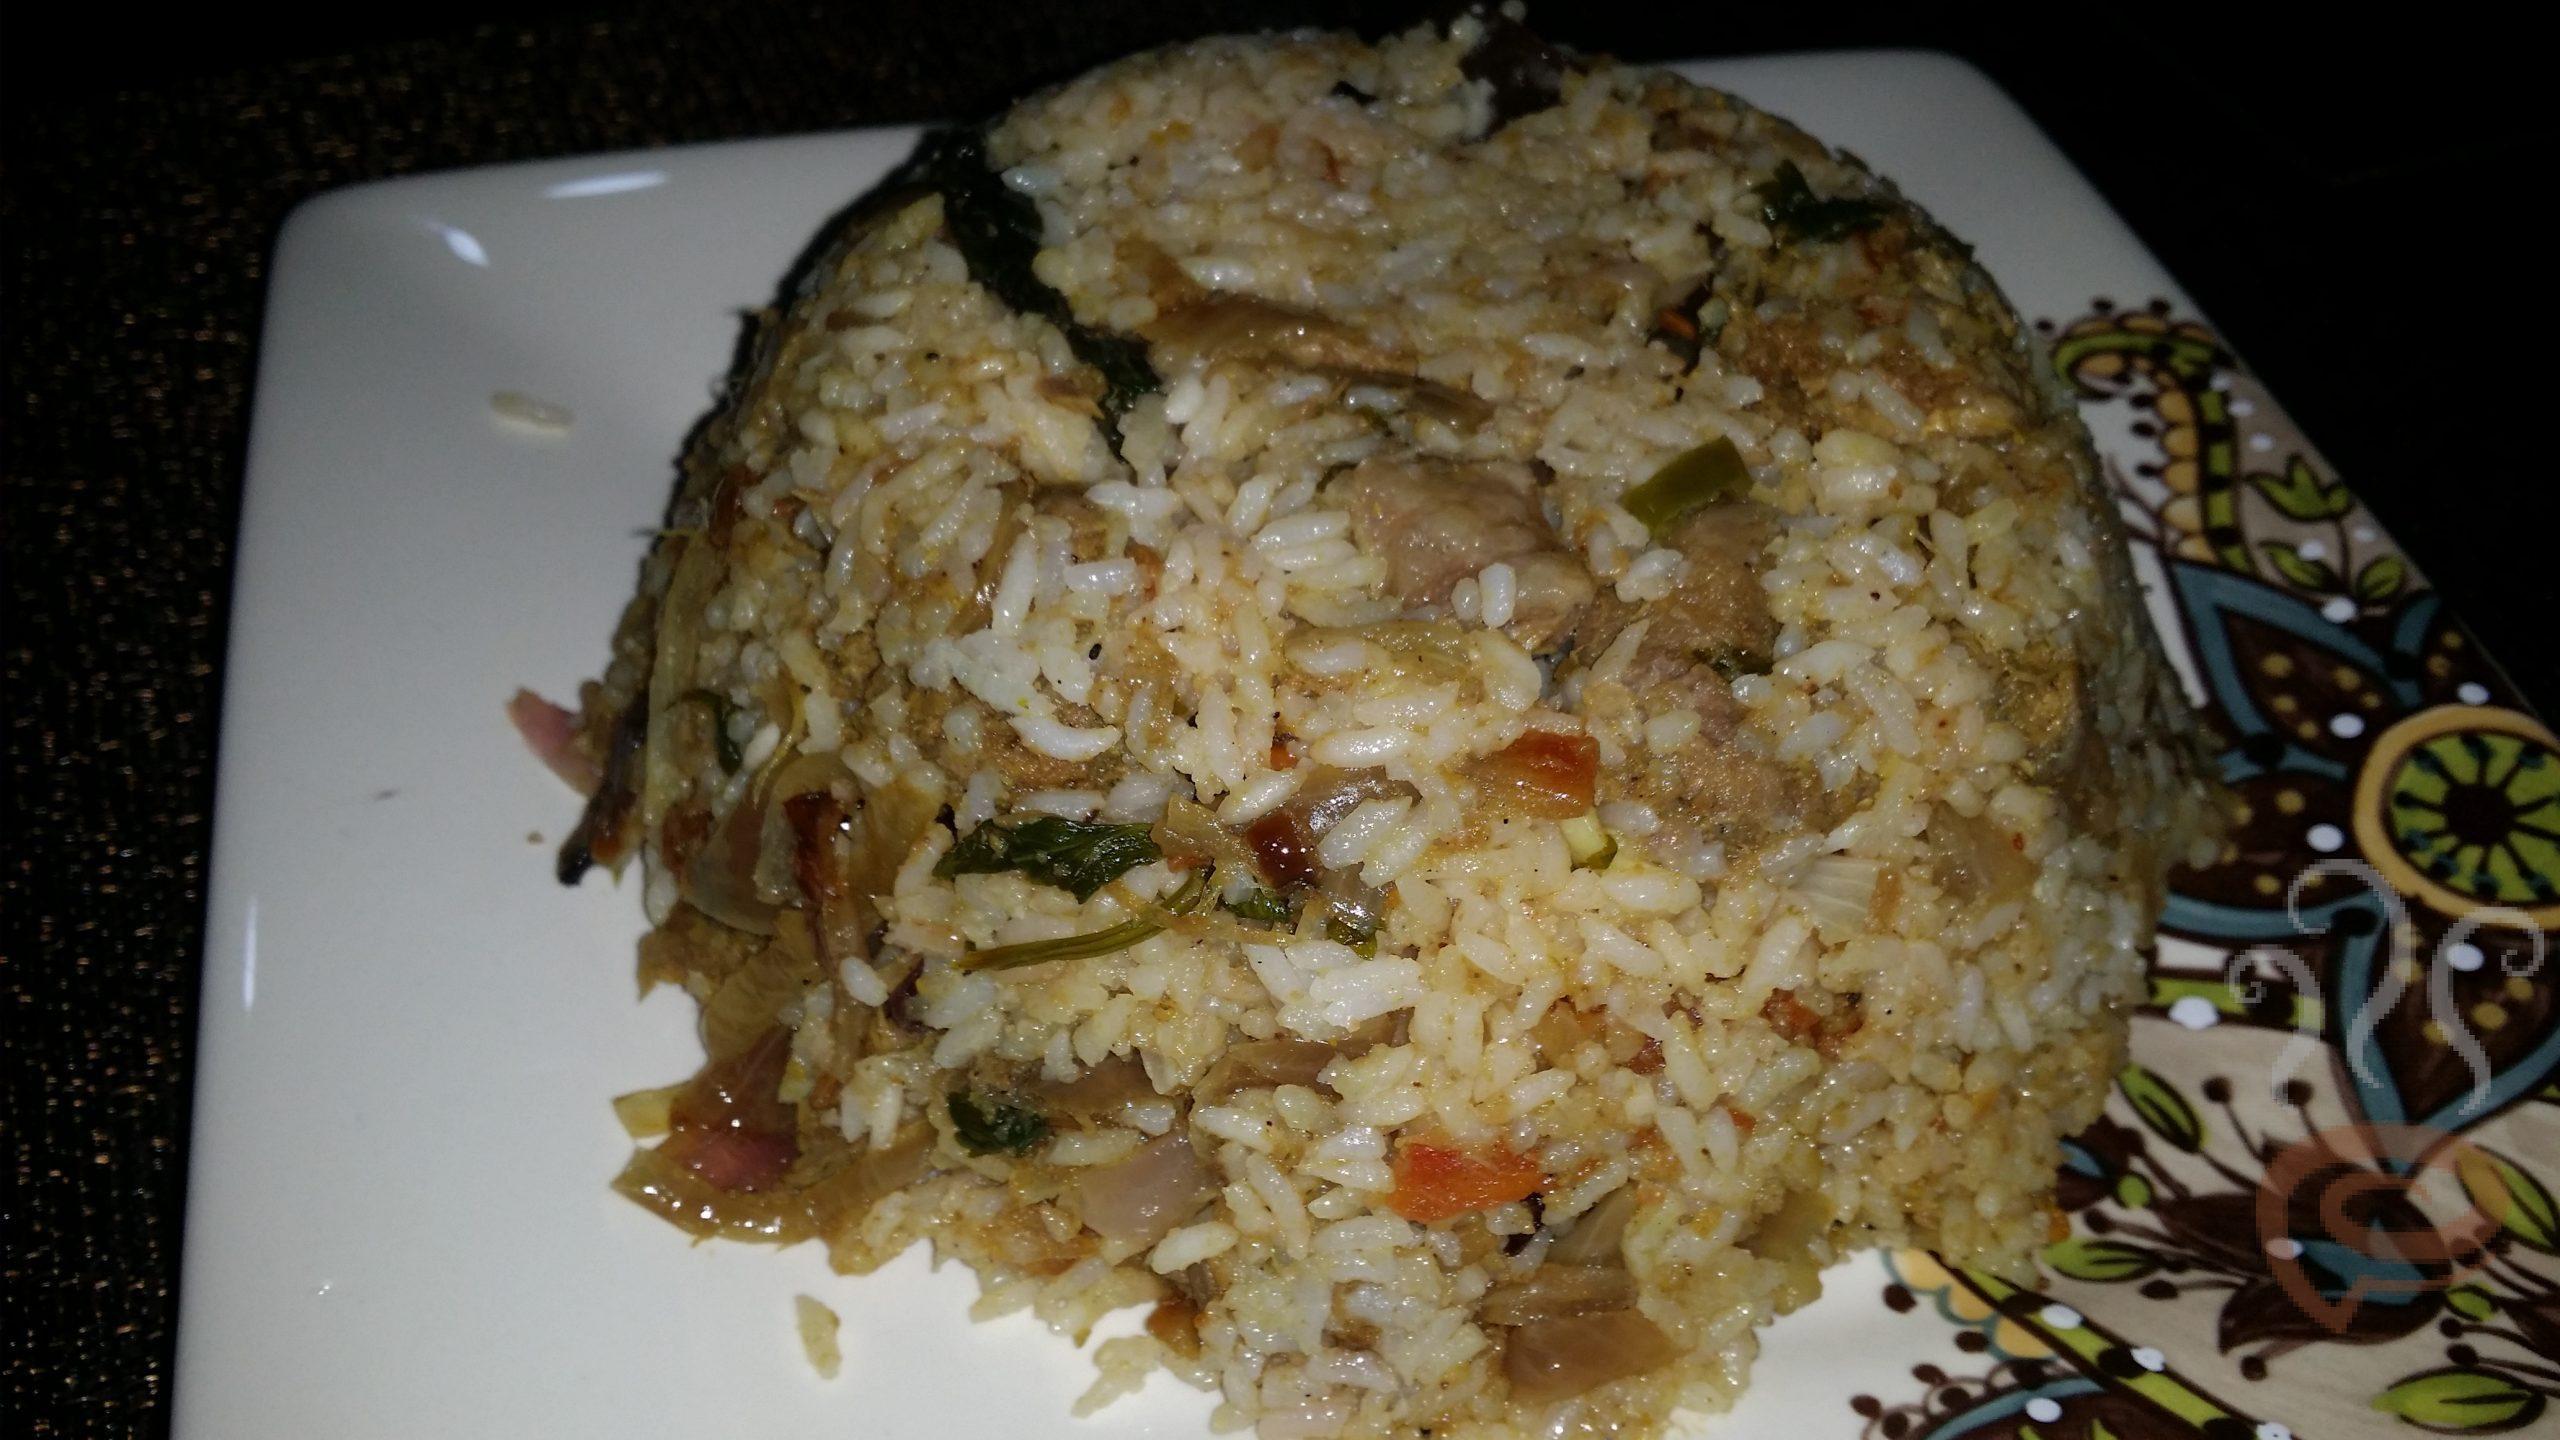 Kerala Restaurant Style Mutton-Beef Biriyani